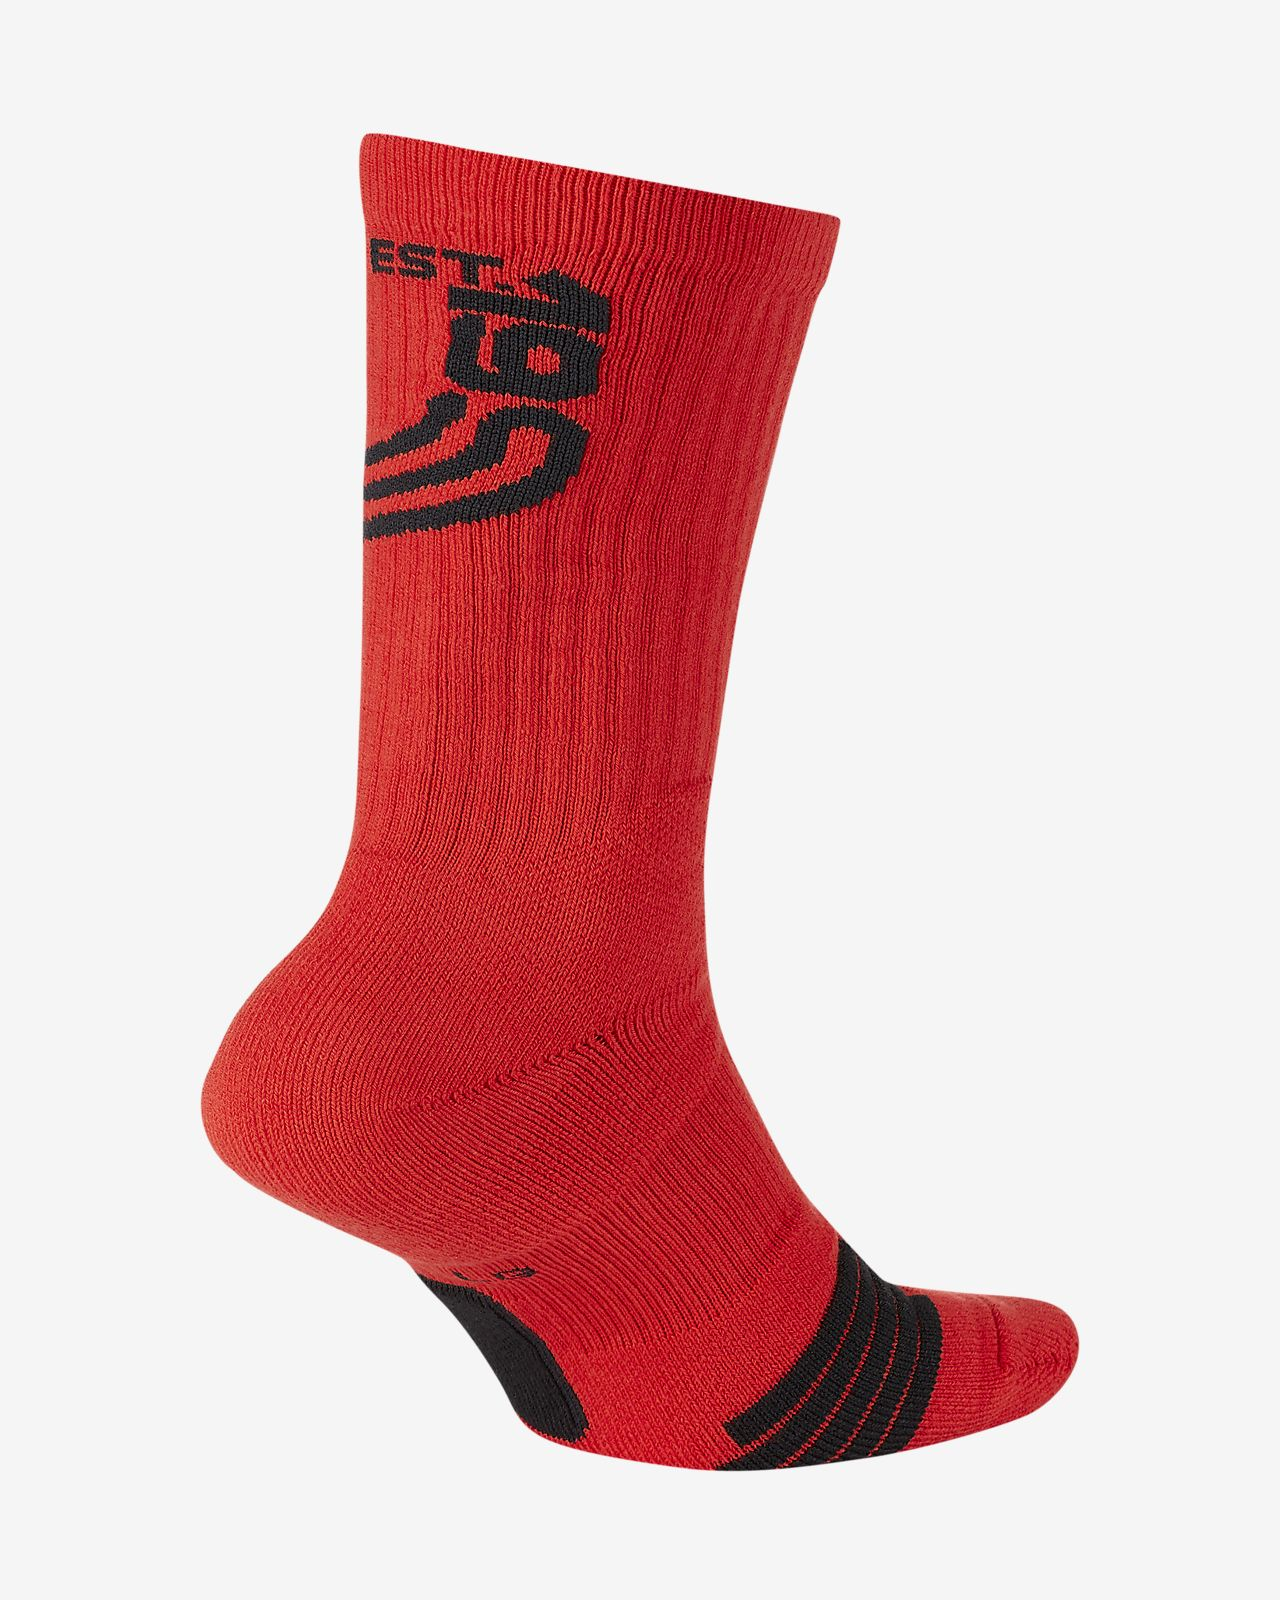 Kyrie Elite Crew Basketball Socks